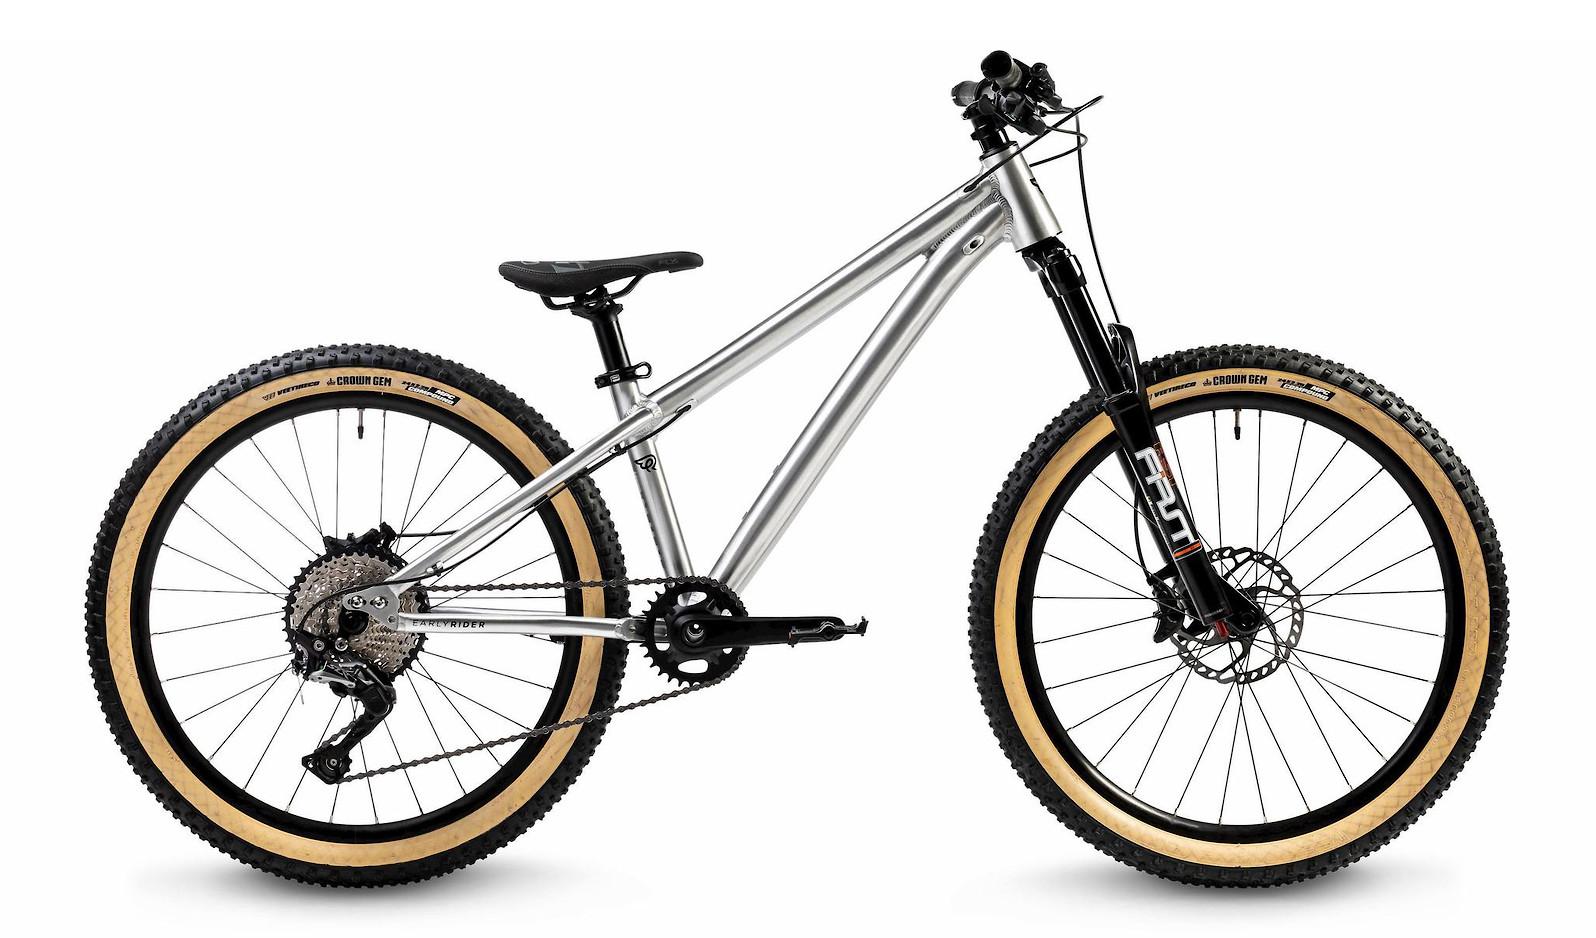 2020 Early Rider Hellion 24